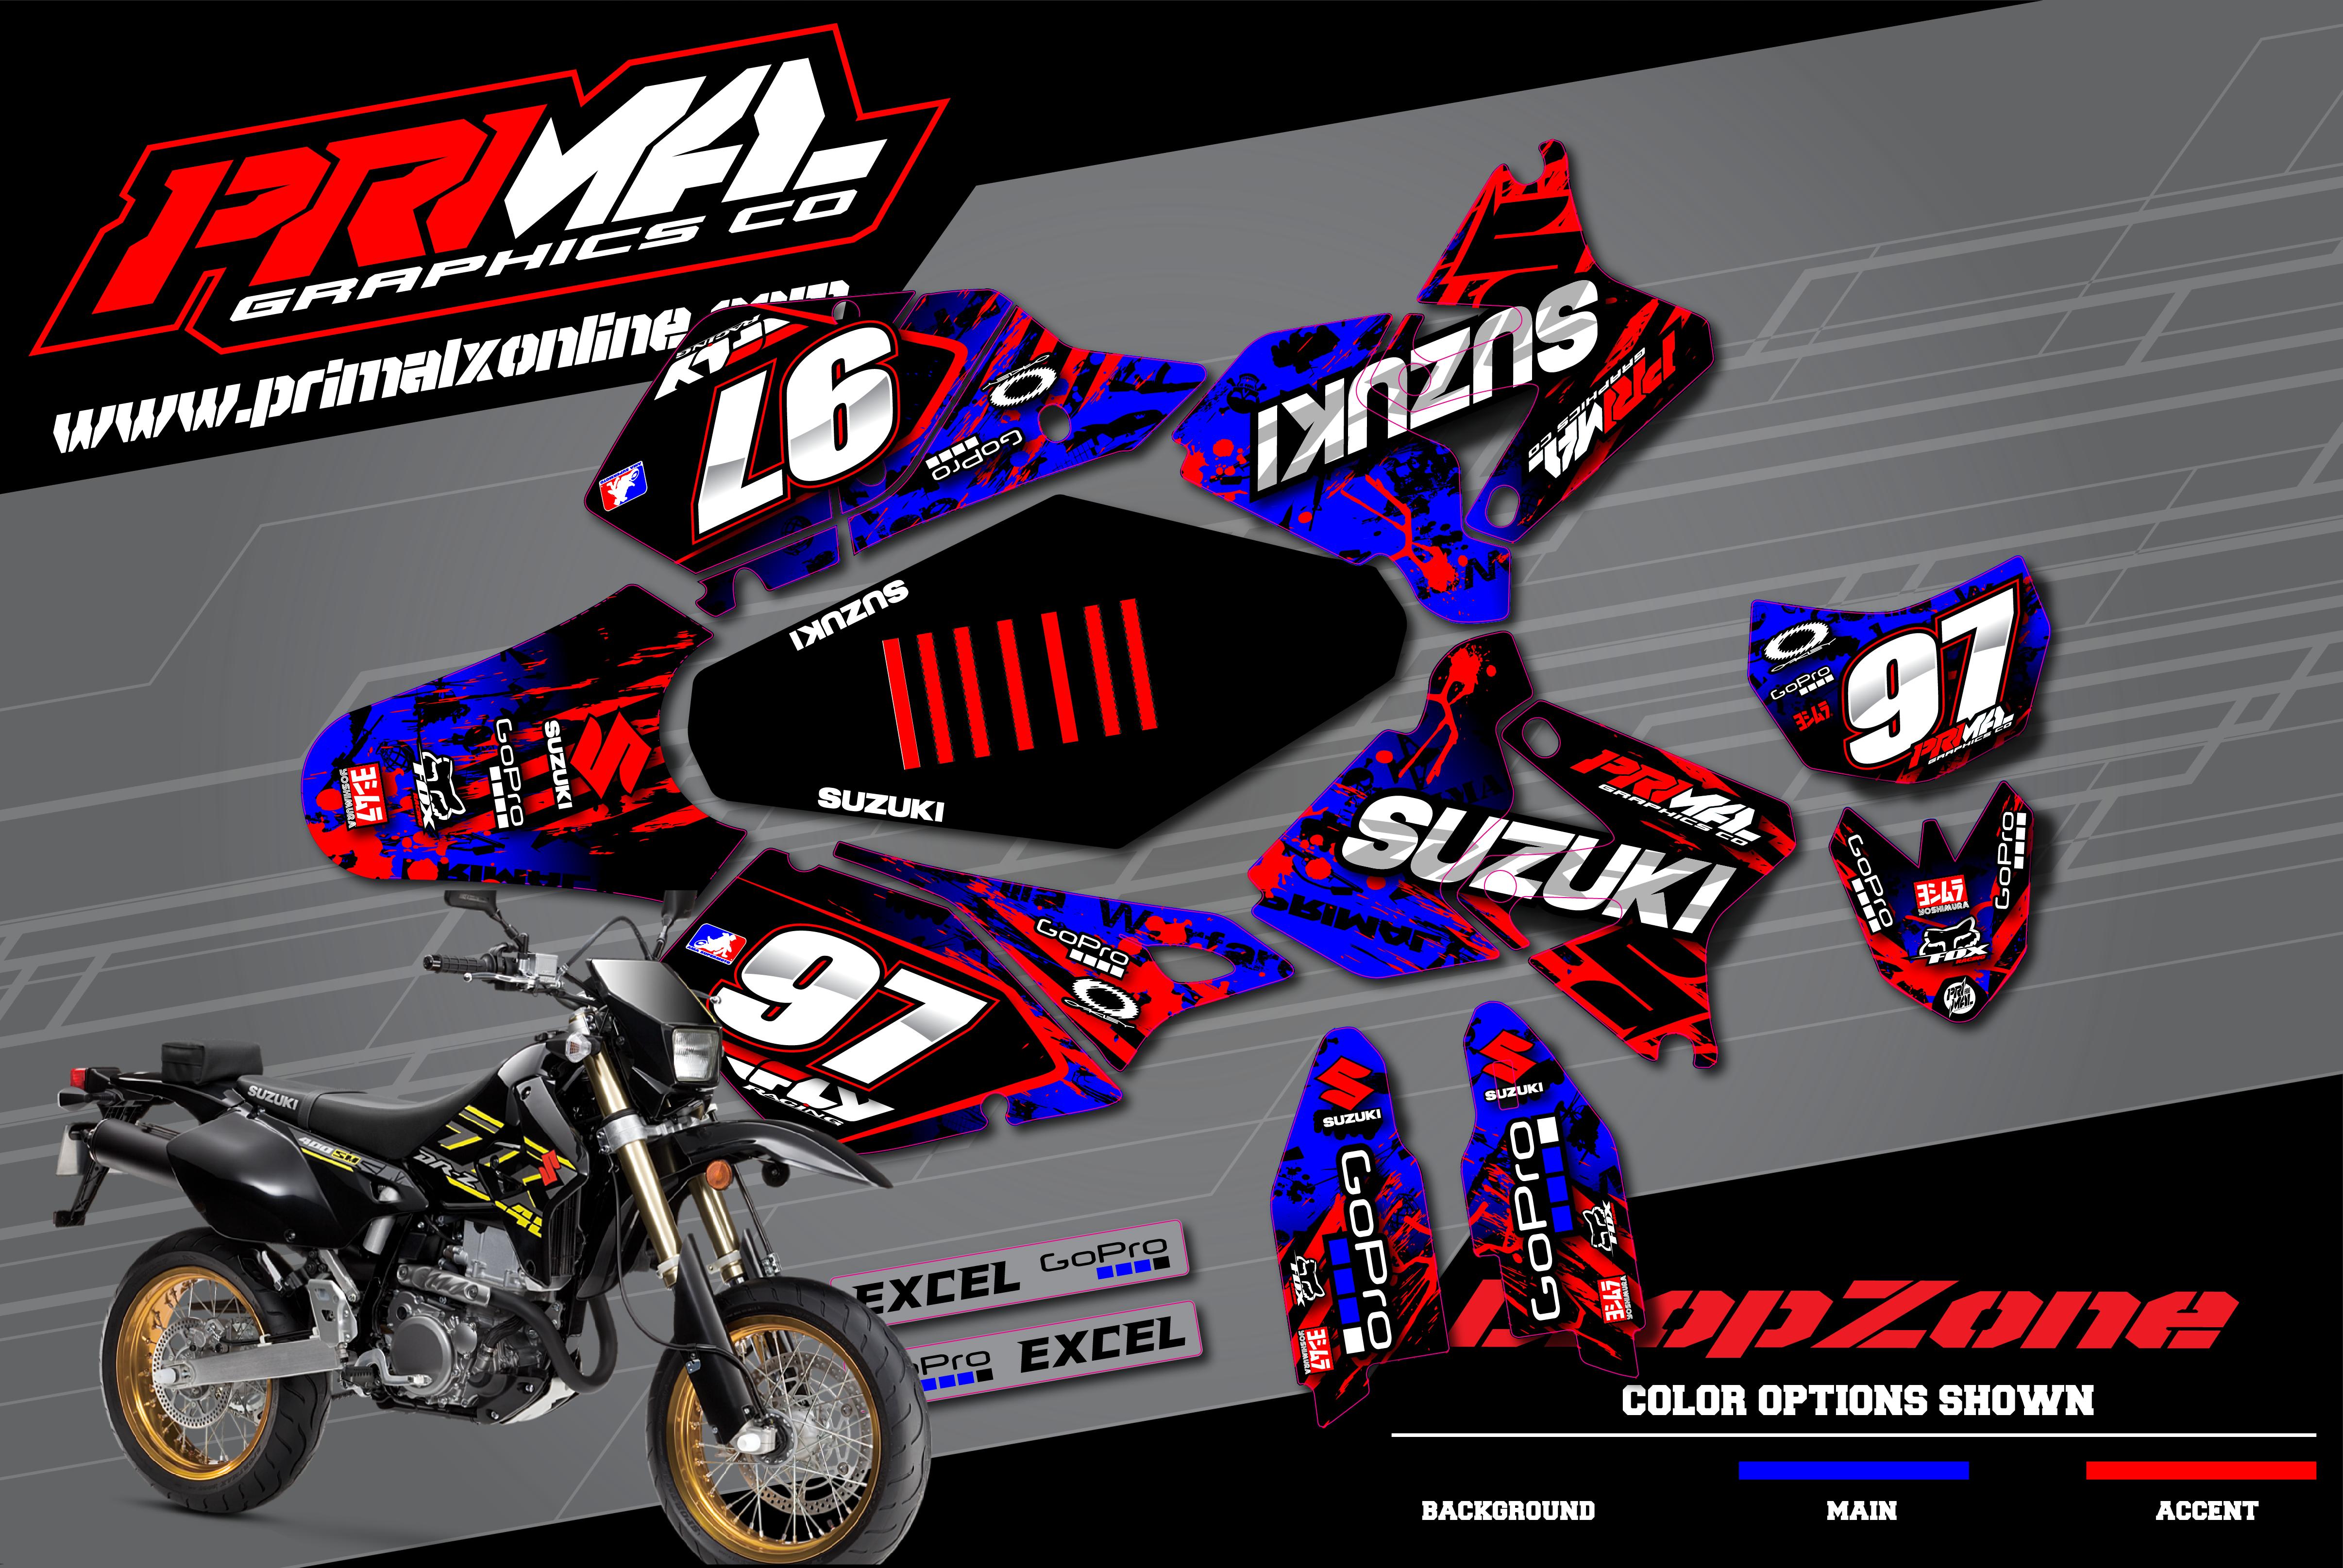 PRIMAL-X-MOTORSPORTS-PRIMAL-GRAPHICS-CO-SUZUKI-DRZ400SM-SUPERMOTO-MOTOCROSS-GRAPHICS-BIKELIFE-CHARMCITY-NEW-DROPZONE-01